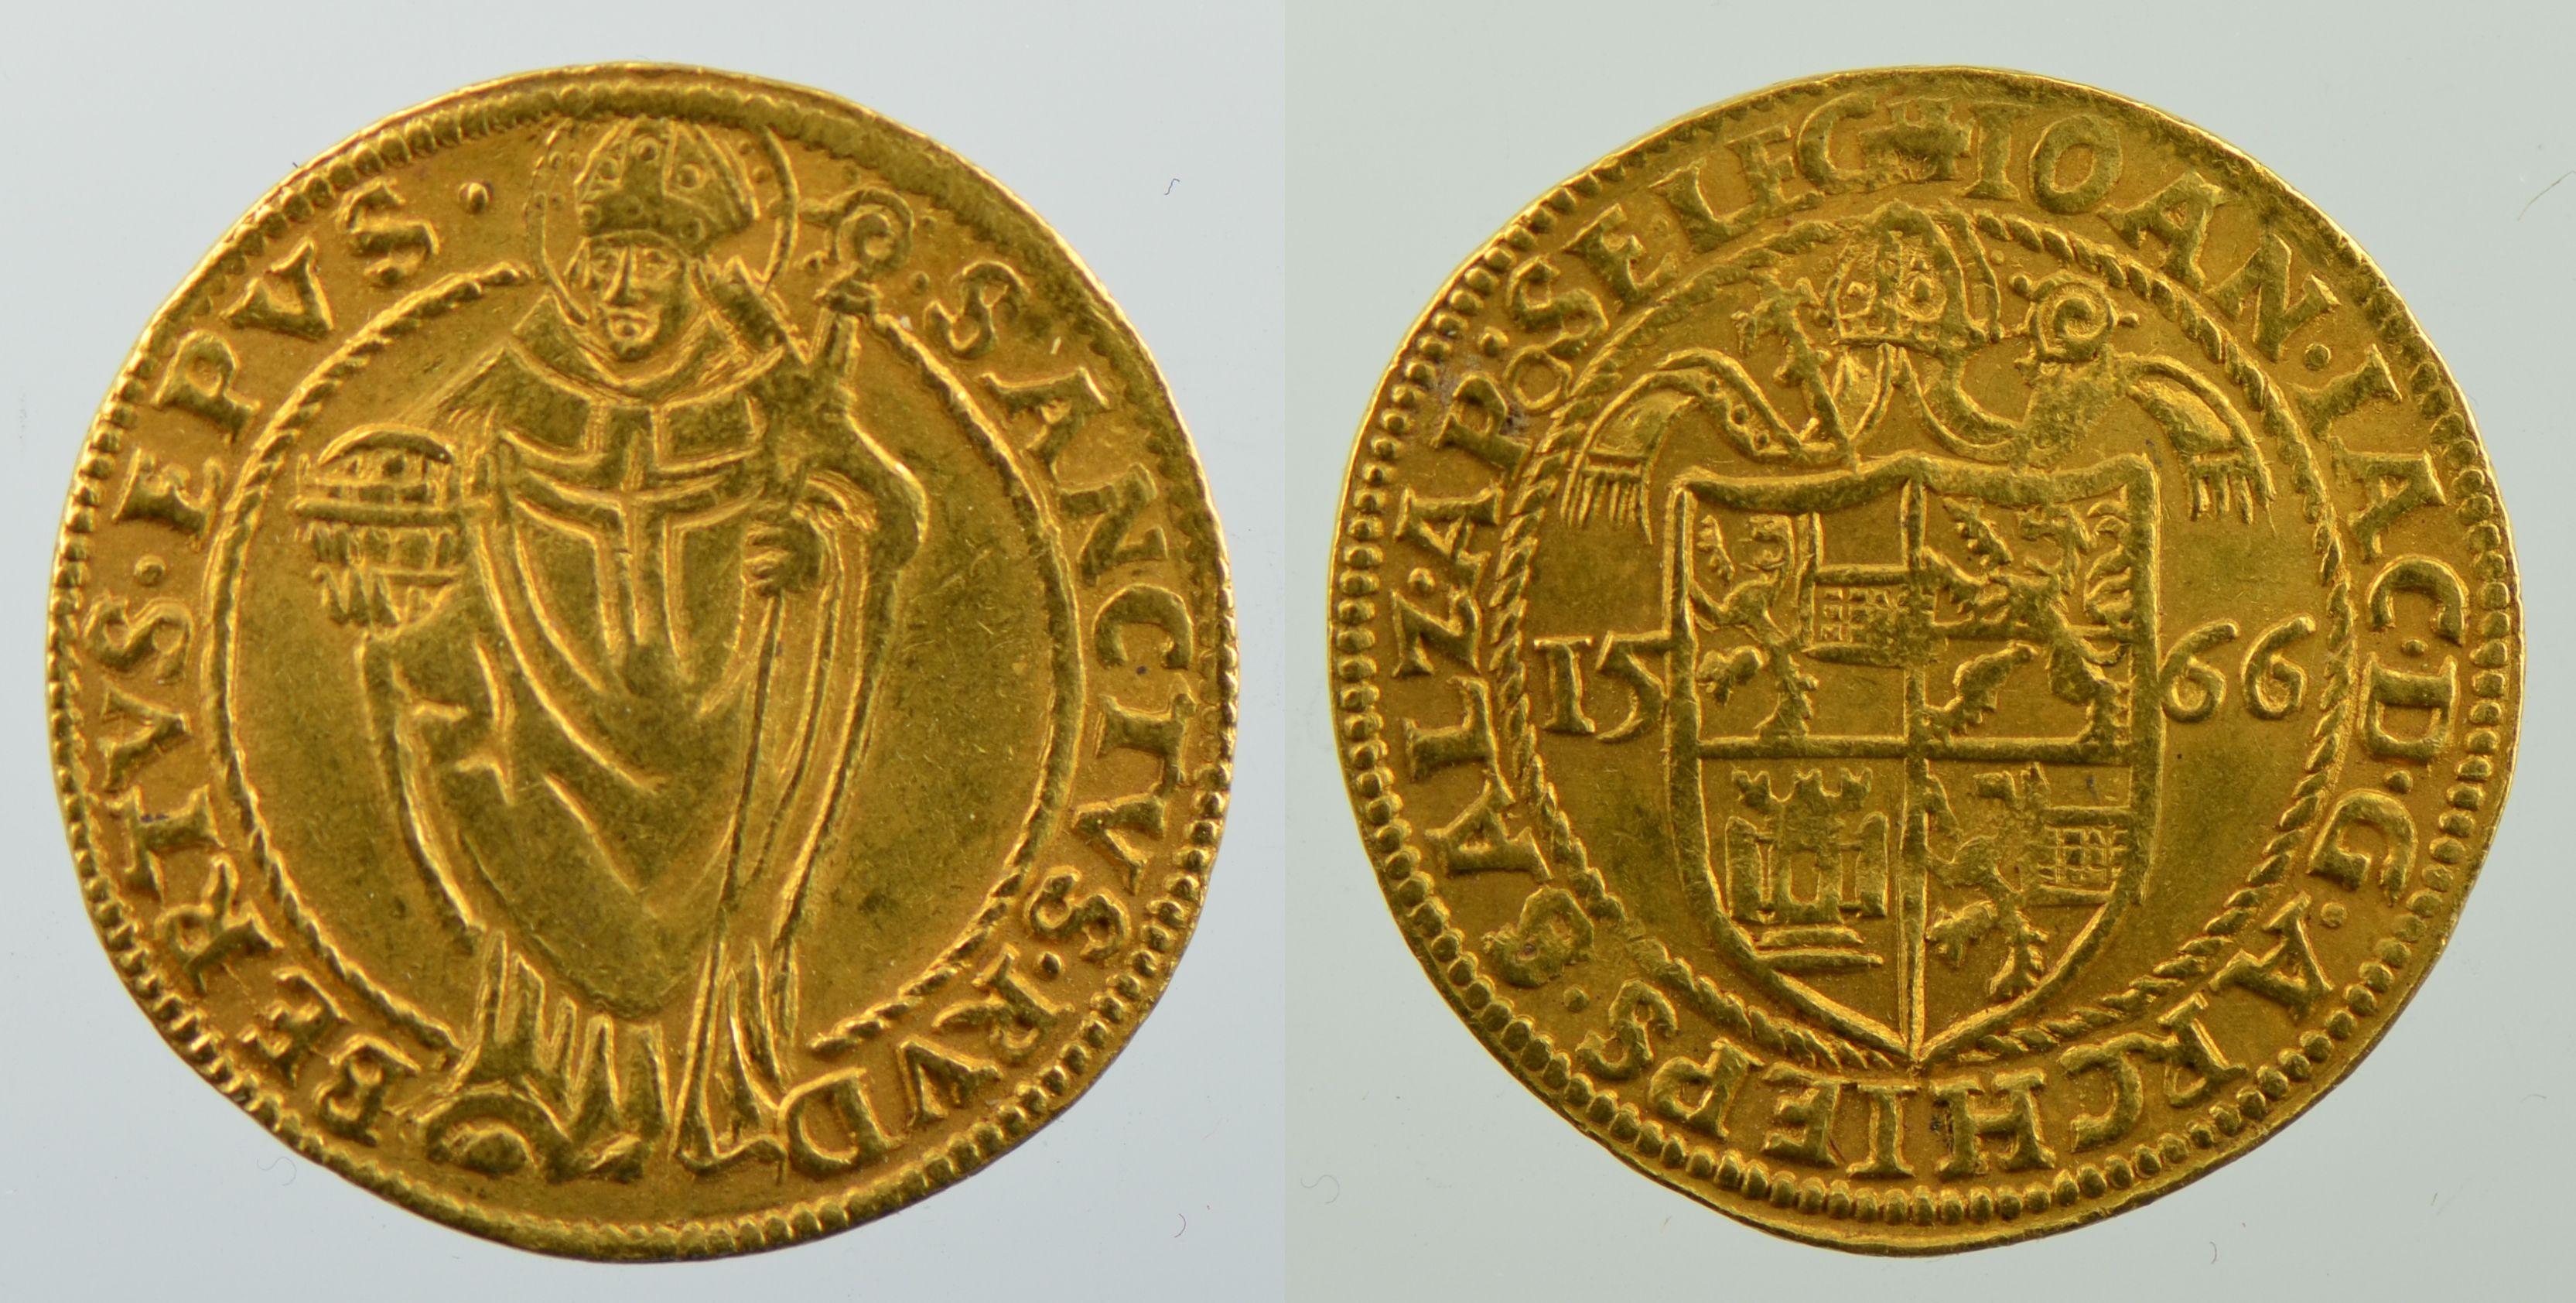 Doppeldukat 1566, Schweizer Nationalmuseum